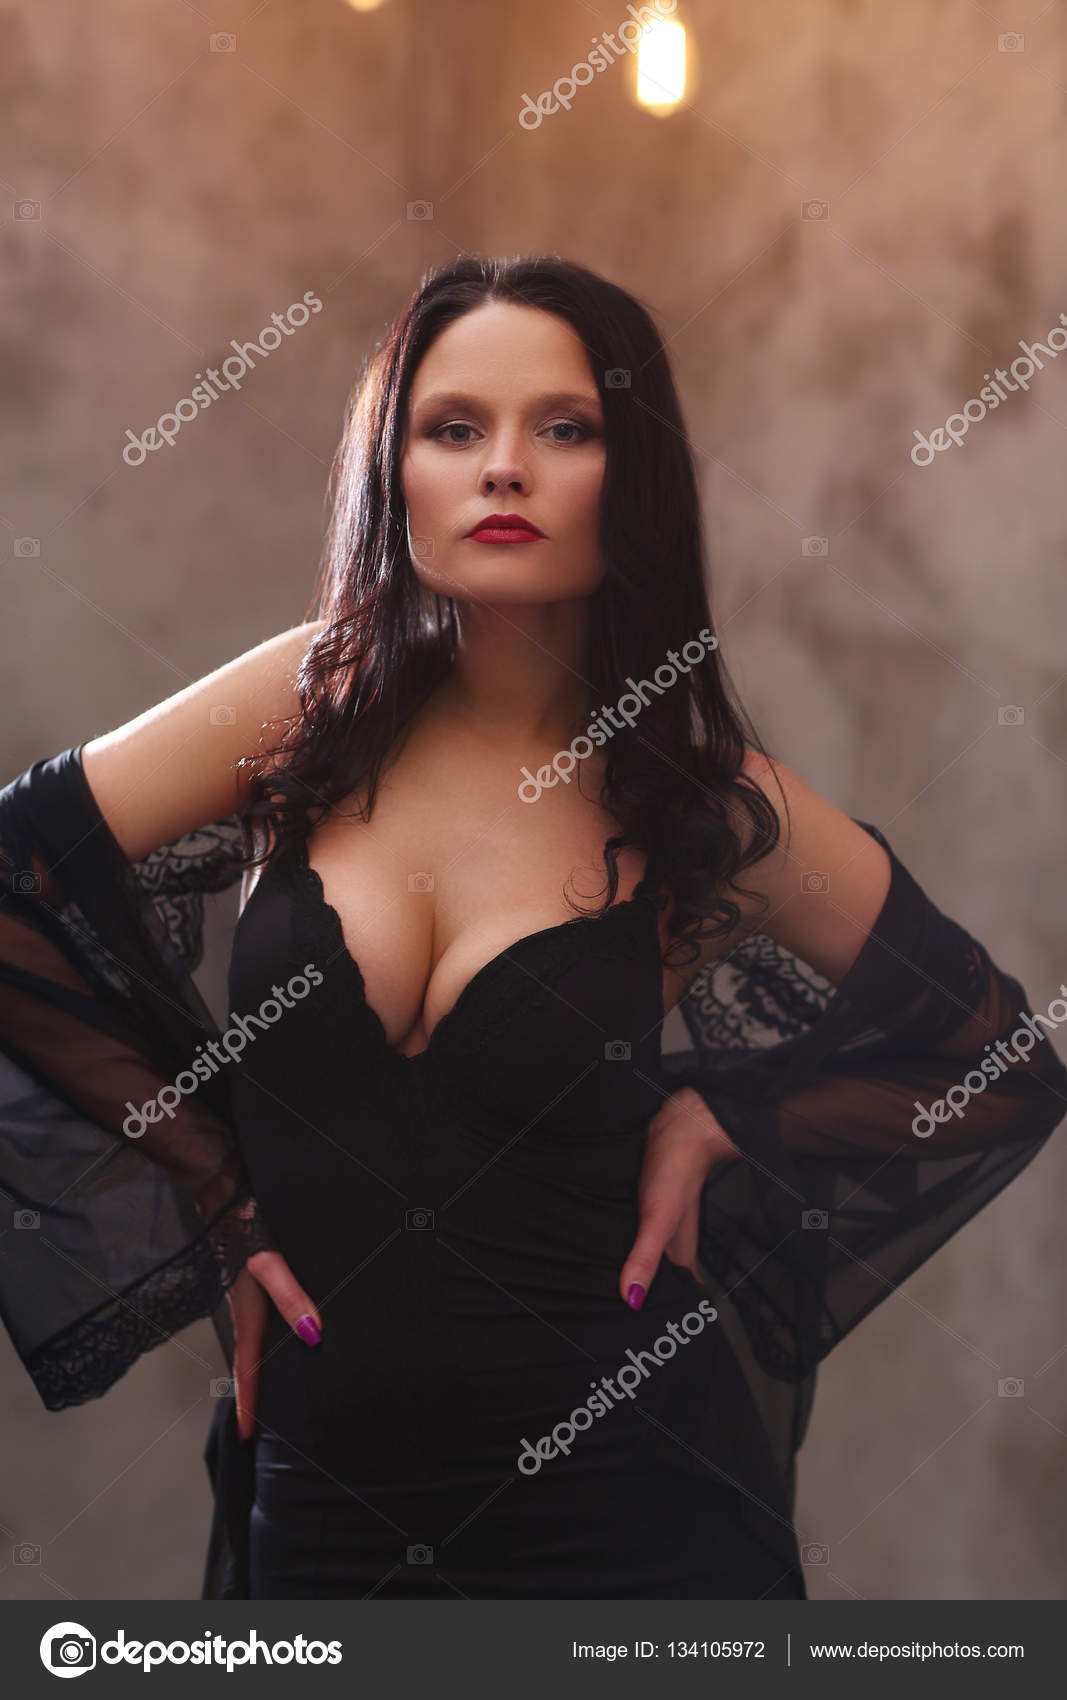 a3ac2663d855 ragazza in abbigliamento di sera — Foto Stock © yekophotostudio ...